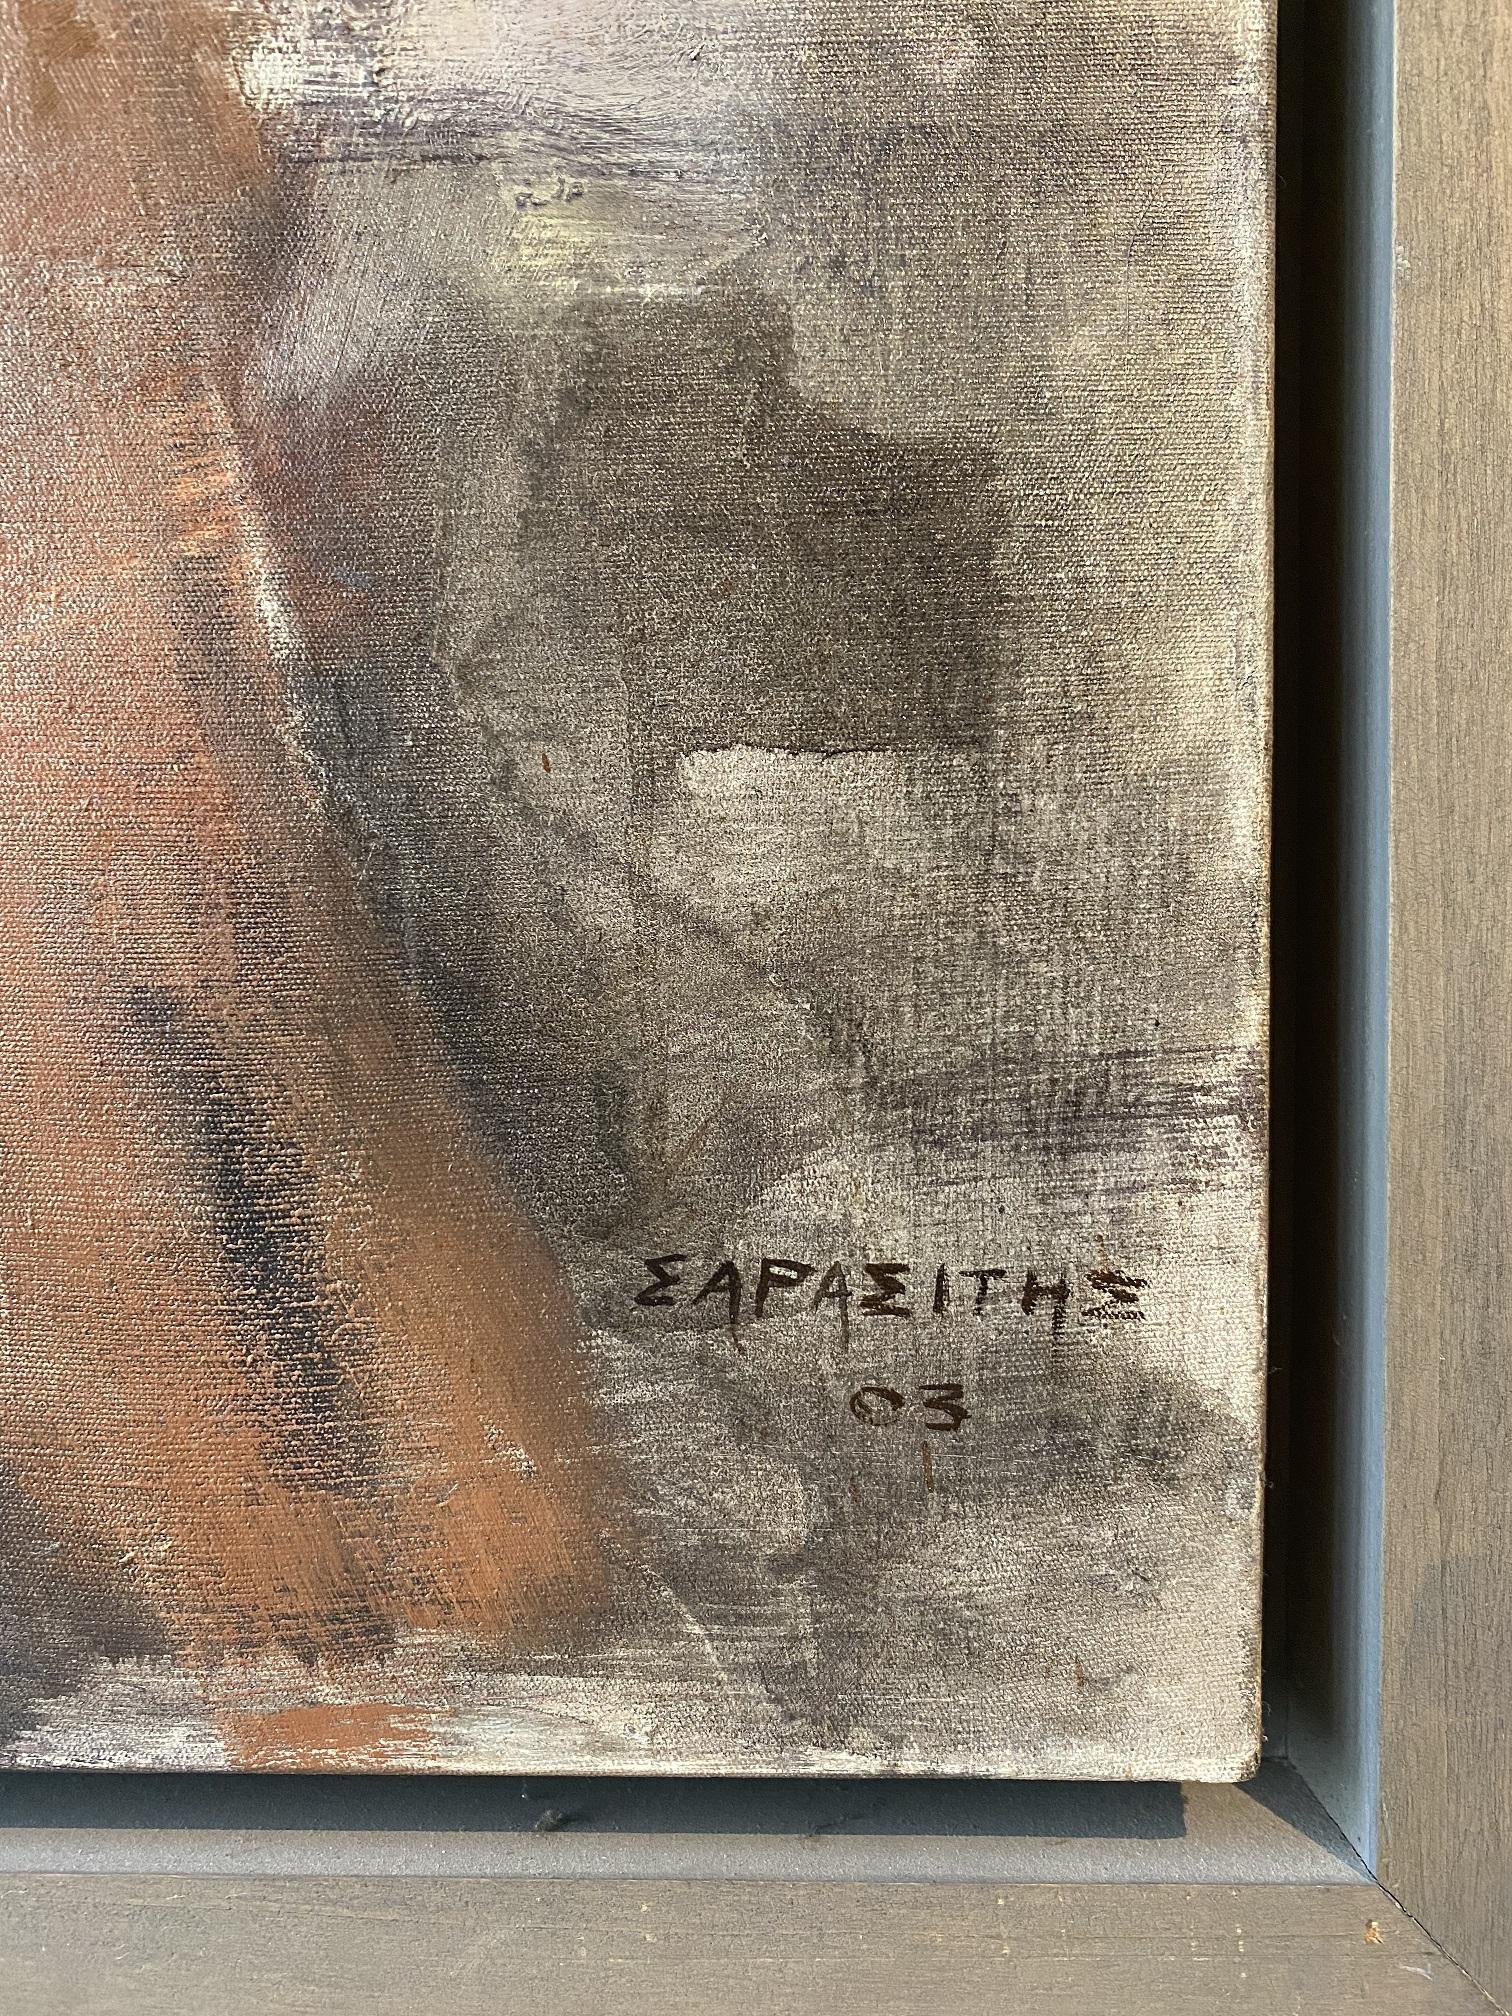 Dimitris Sarasitis (Greek, born 1963) (AR), Woman, 2003, oil on canvas, 80 x 100 cm - Image 2 of 2